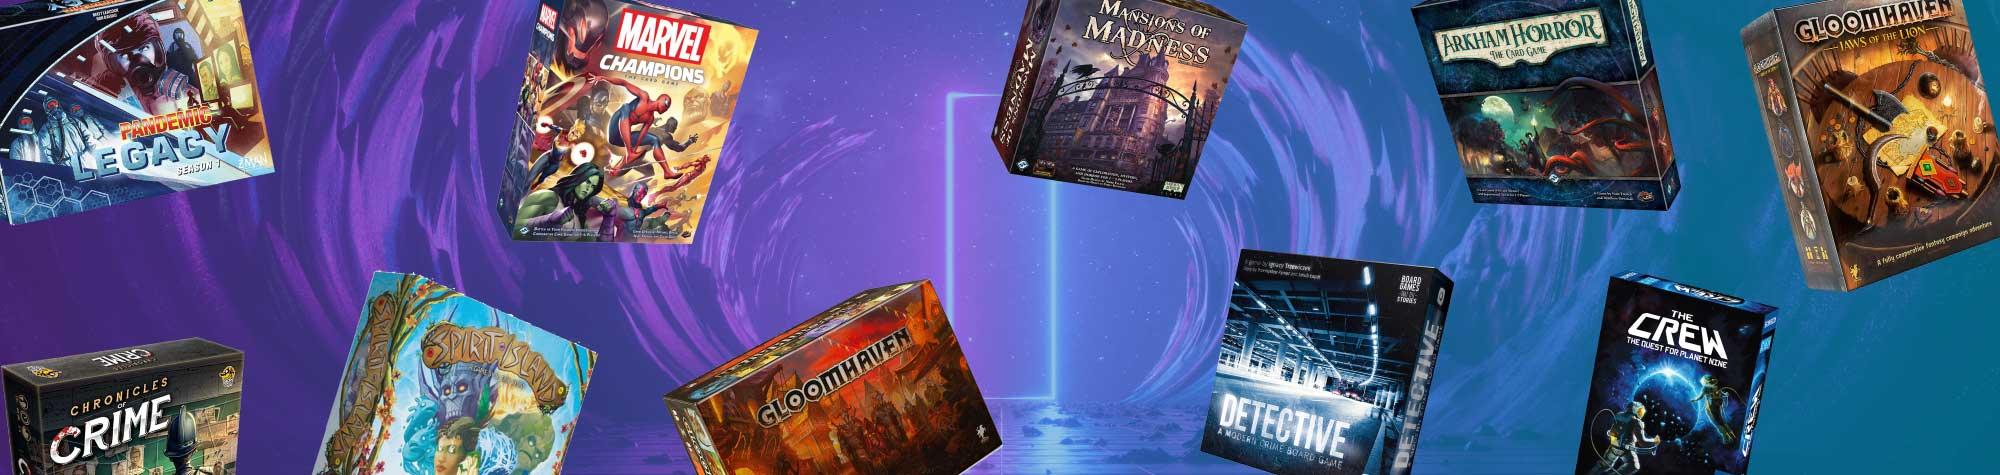 Top 10 Cooperative Board Games